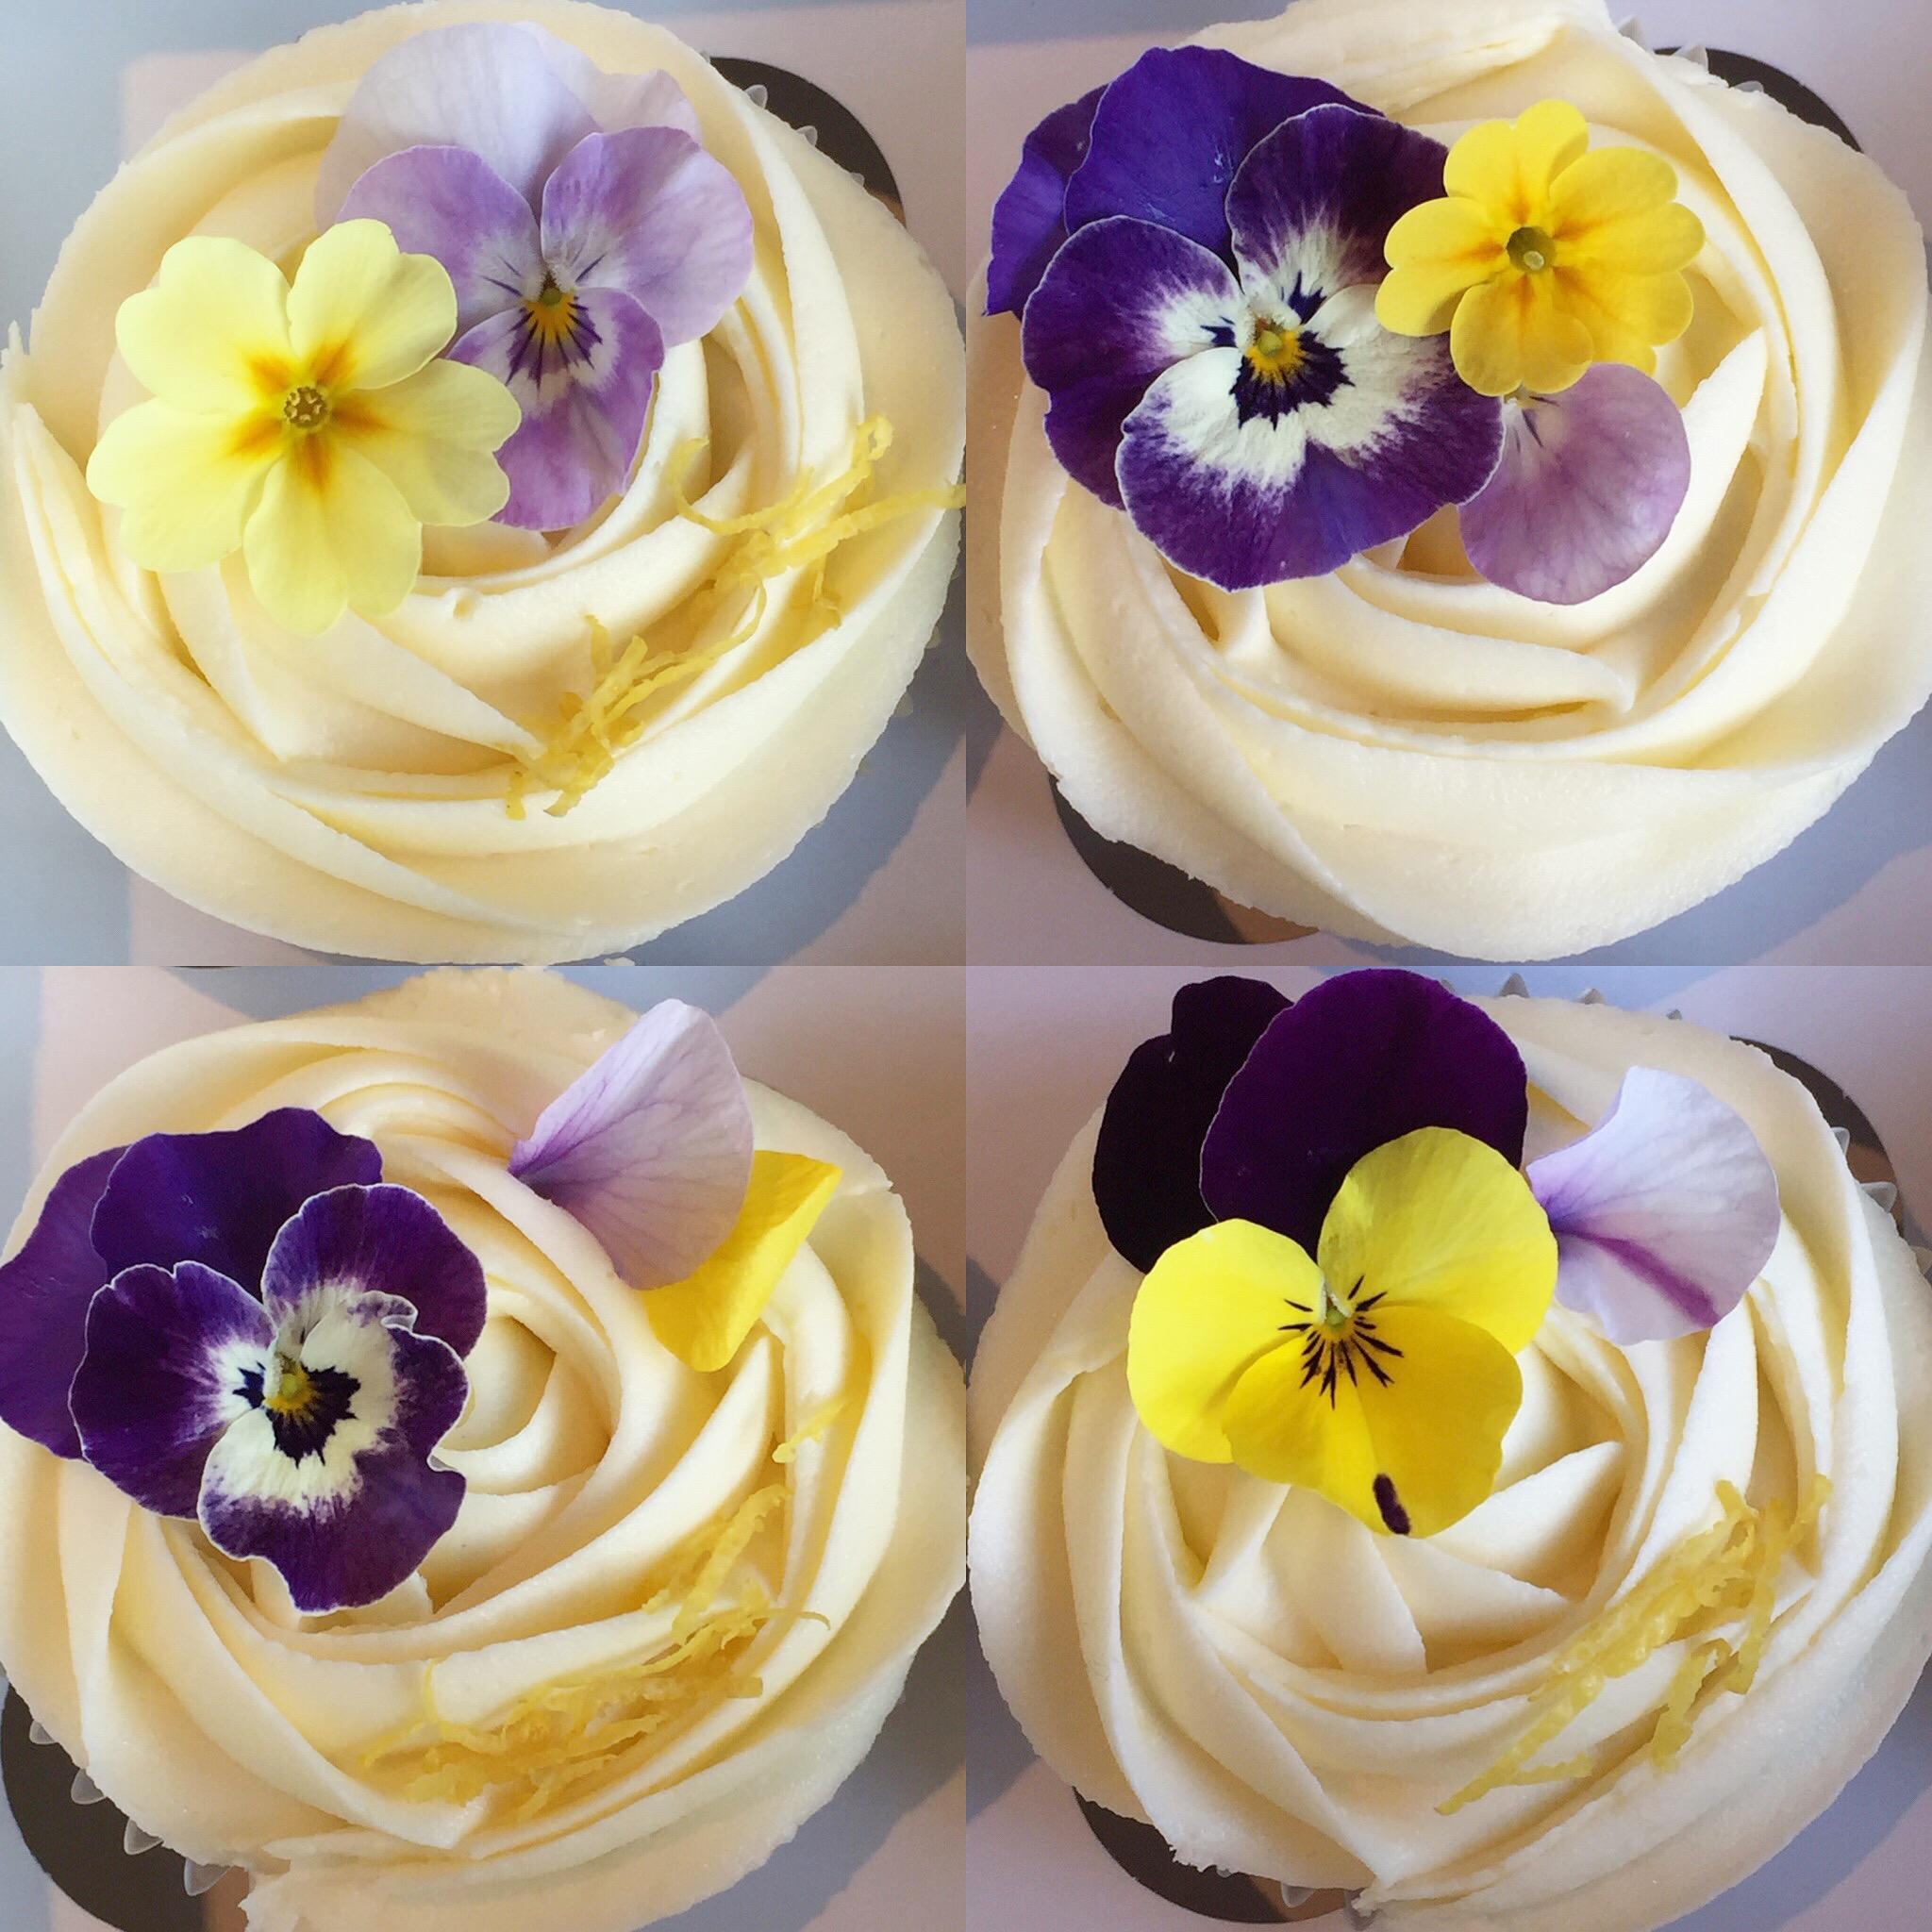 Gluten & Dairy-free cupcakes